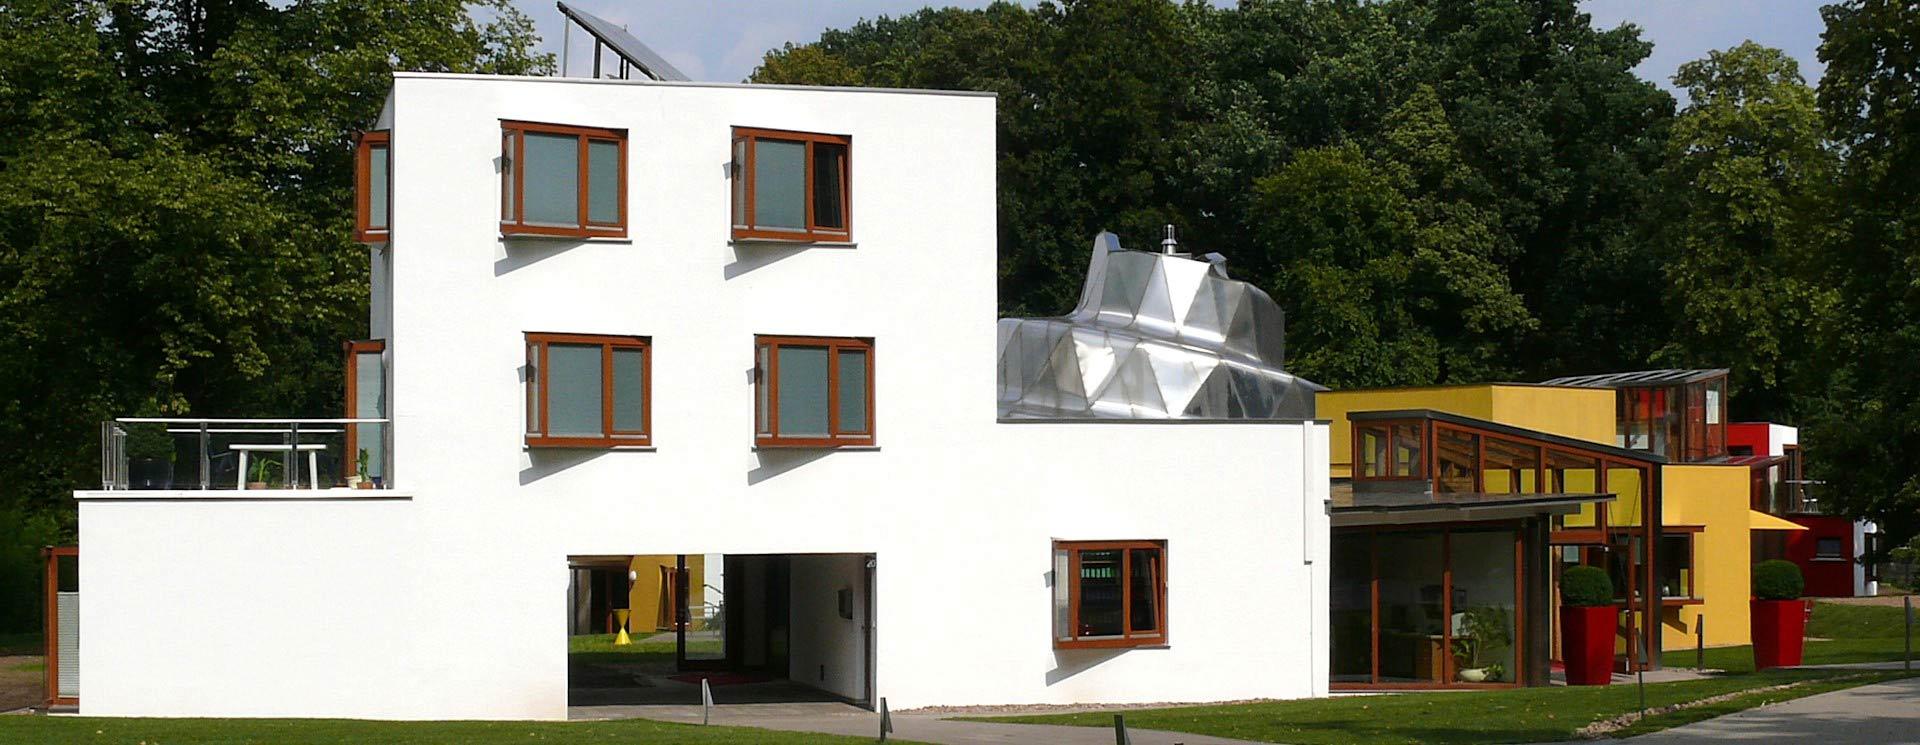 Ronald Mcdonald Haus Bad Oeynhausen